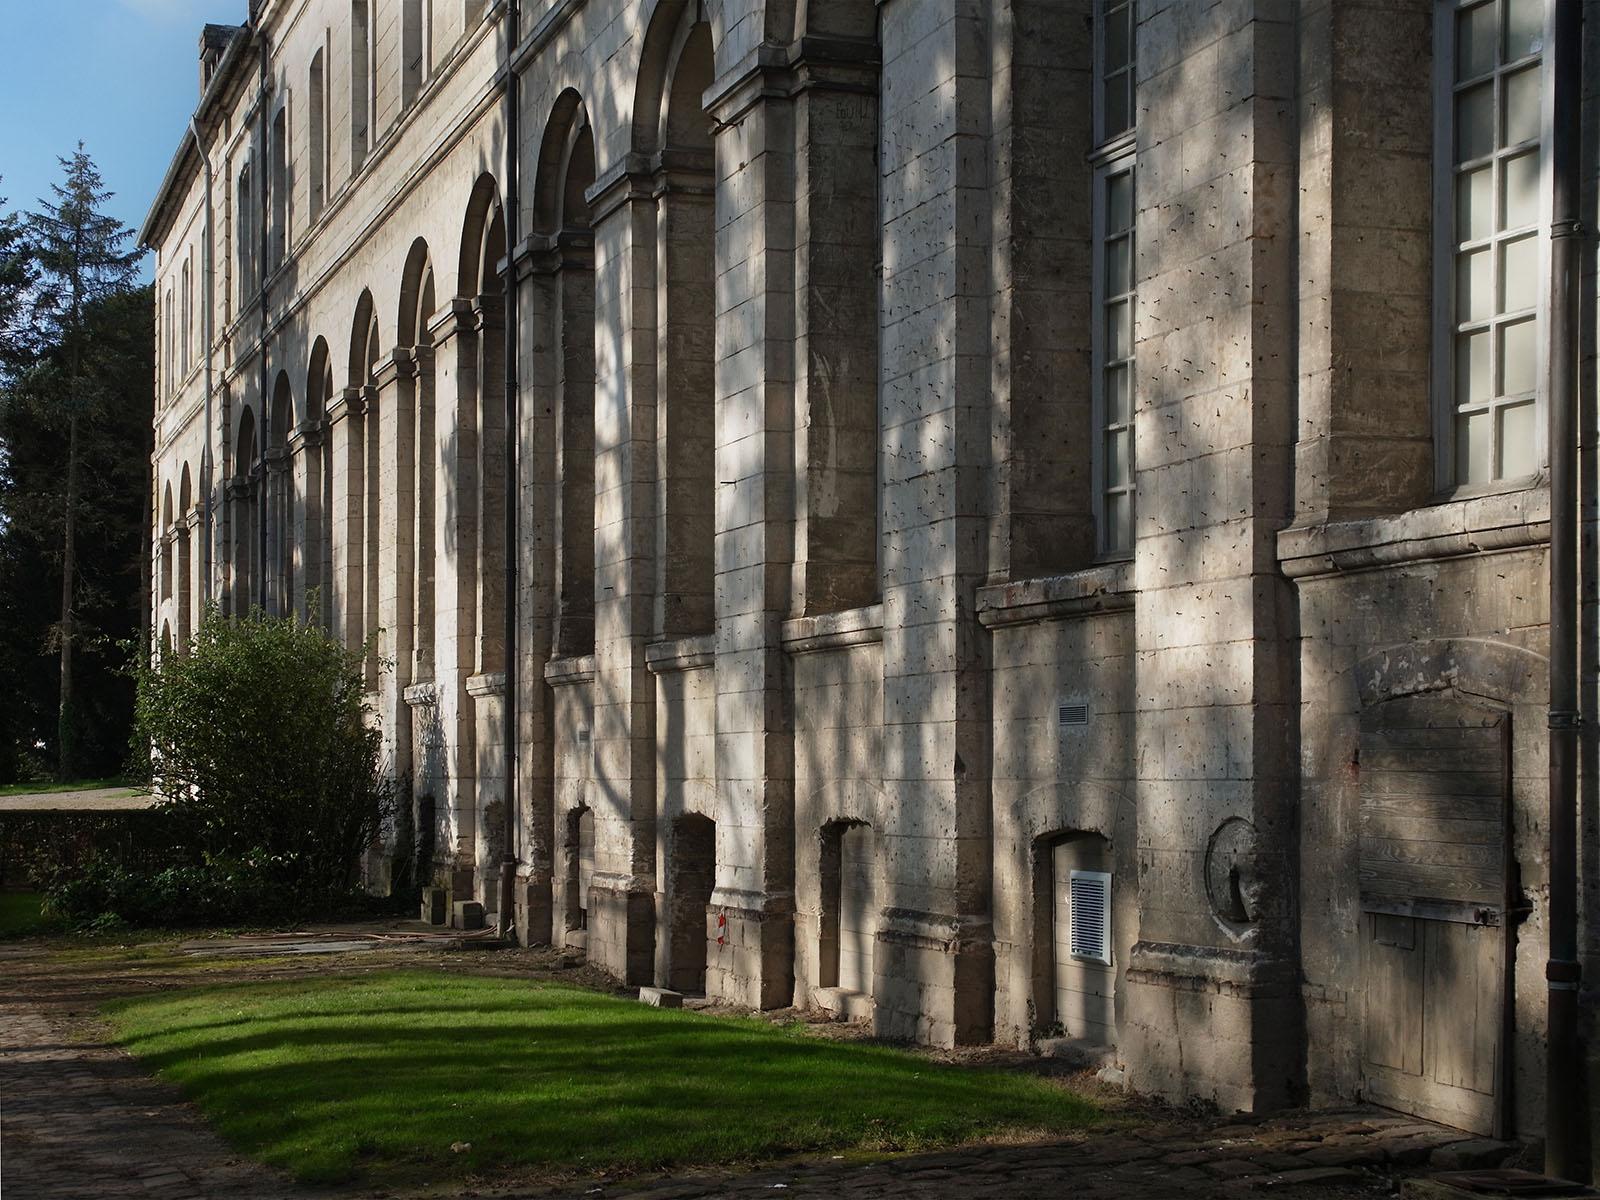 saint-riquier-monastere-sud